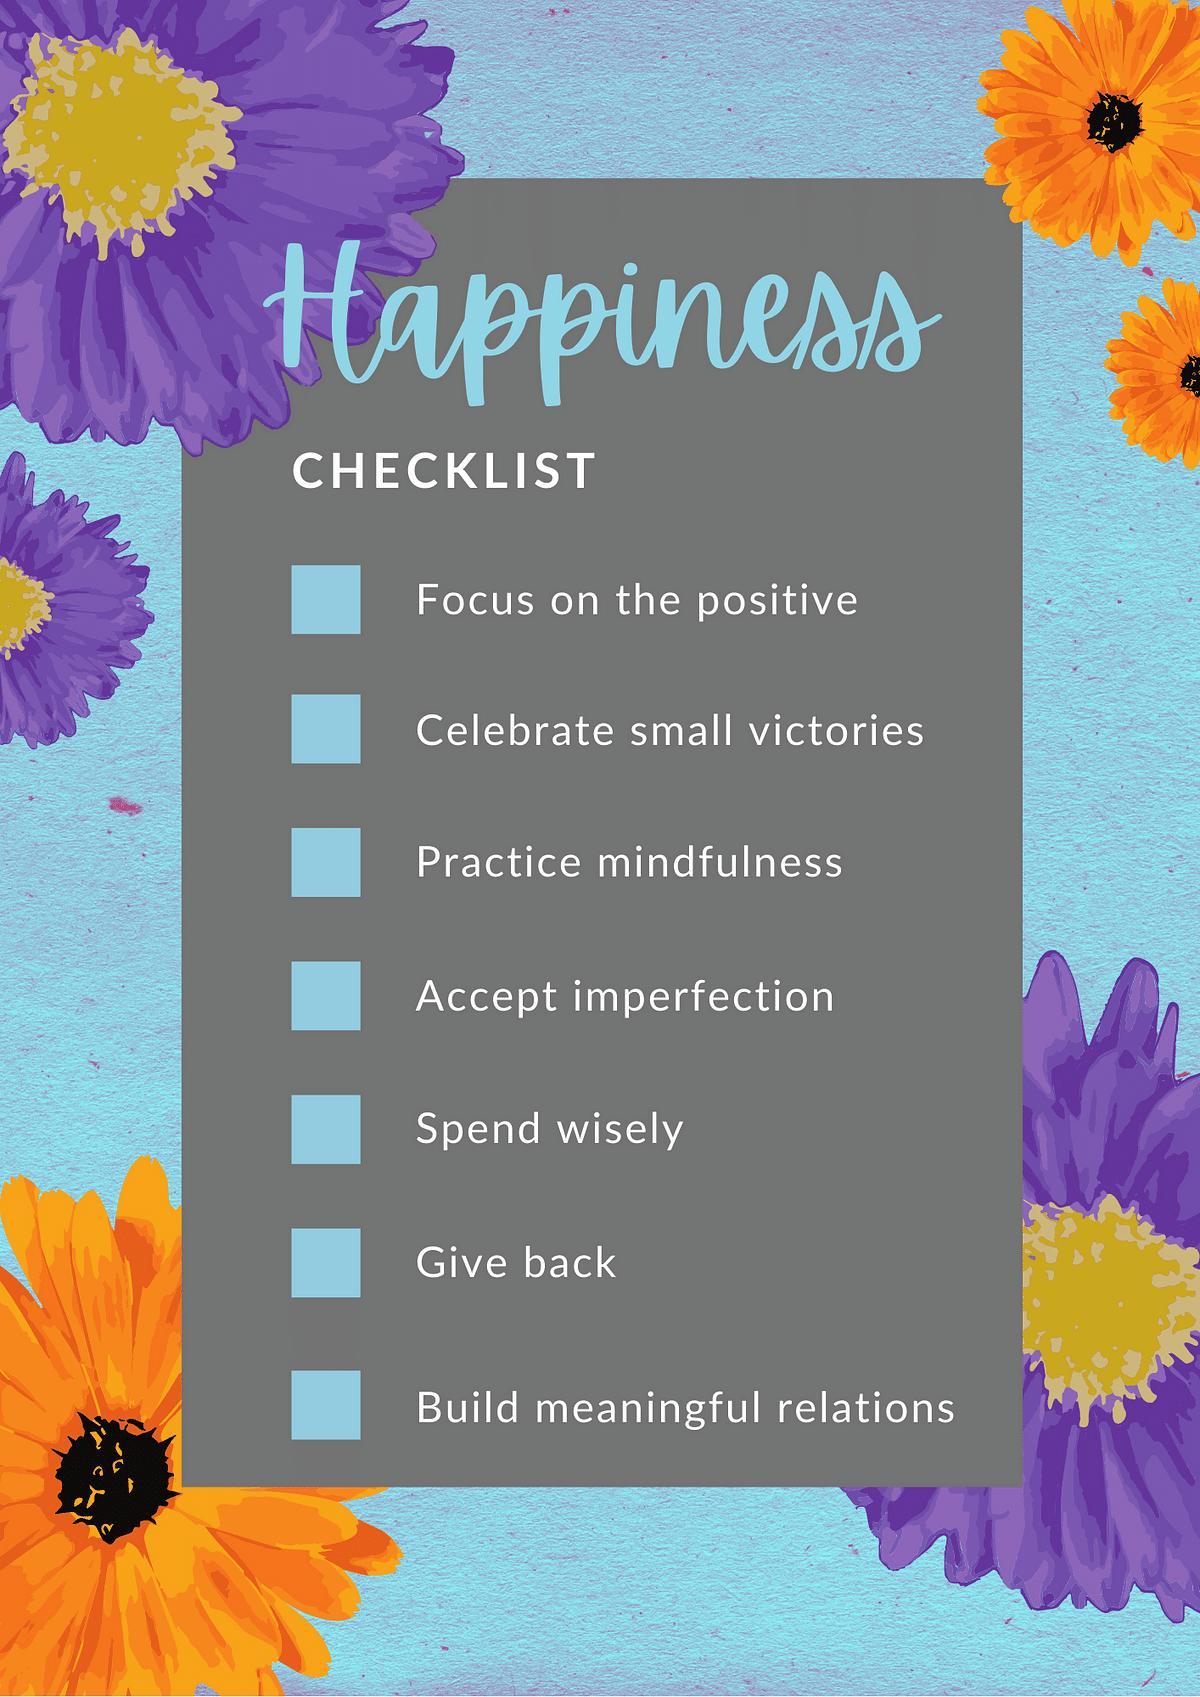 A checklist for ensuring you feel happy